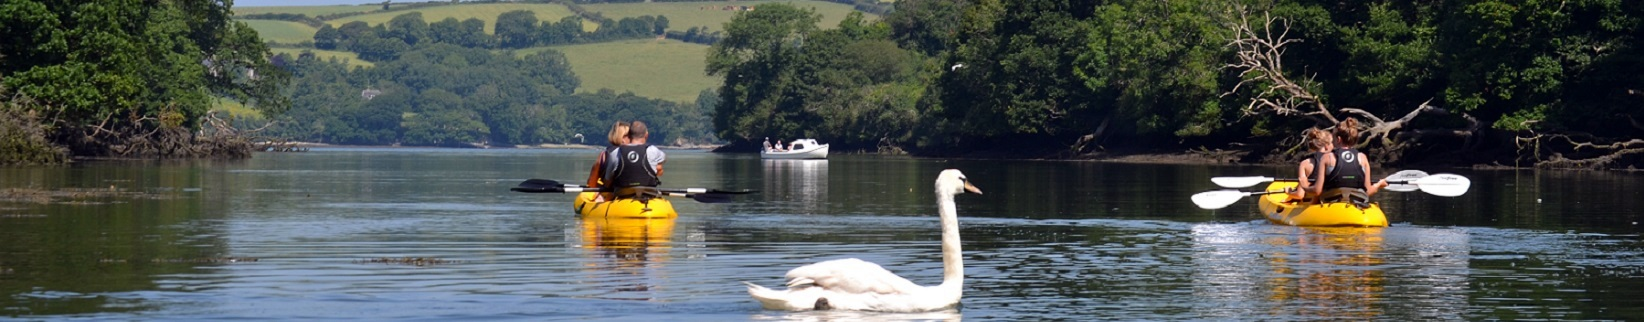 Koru Kayaking Cornwall Header